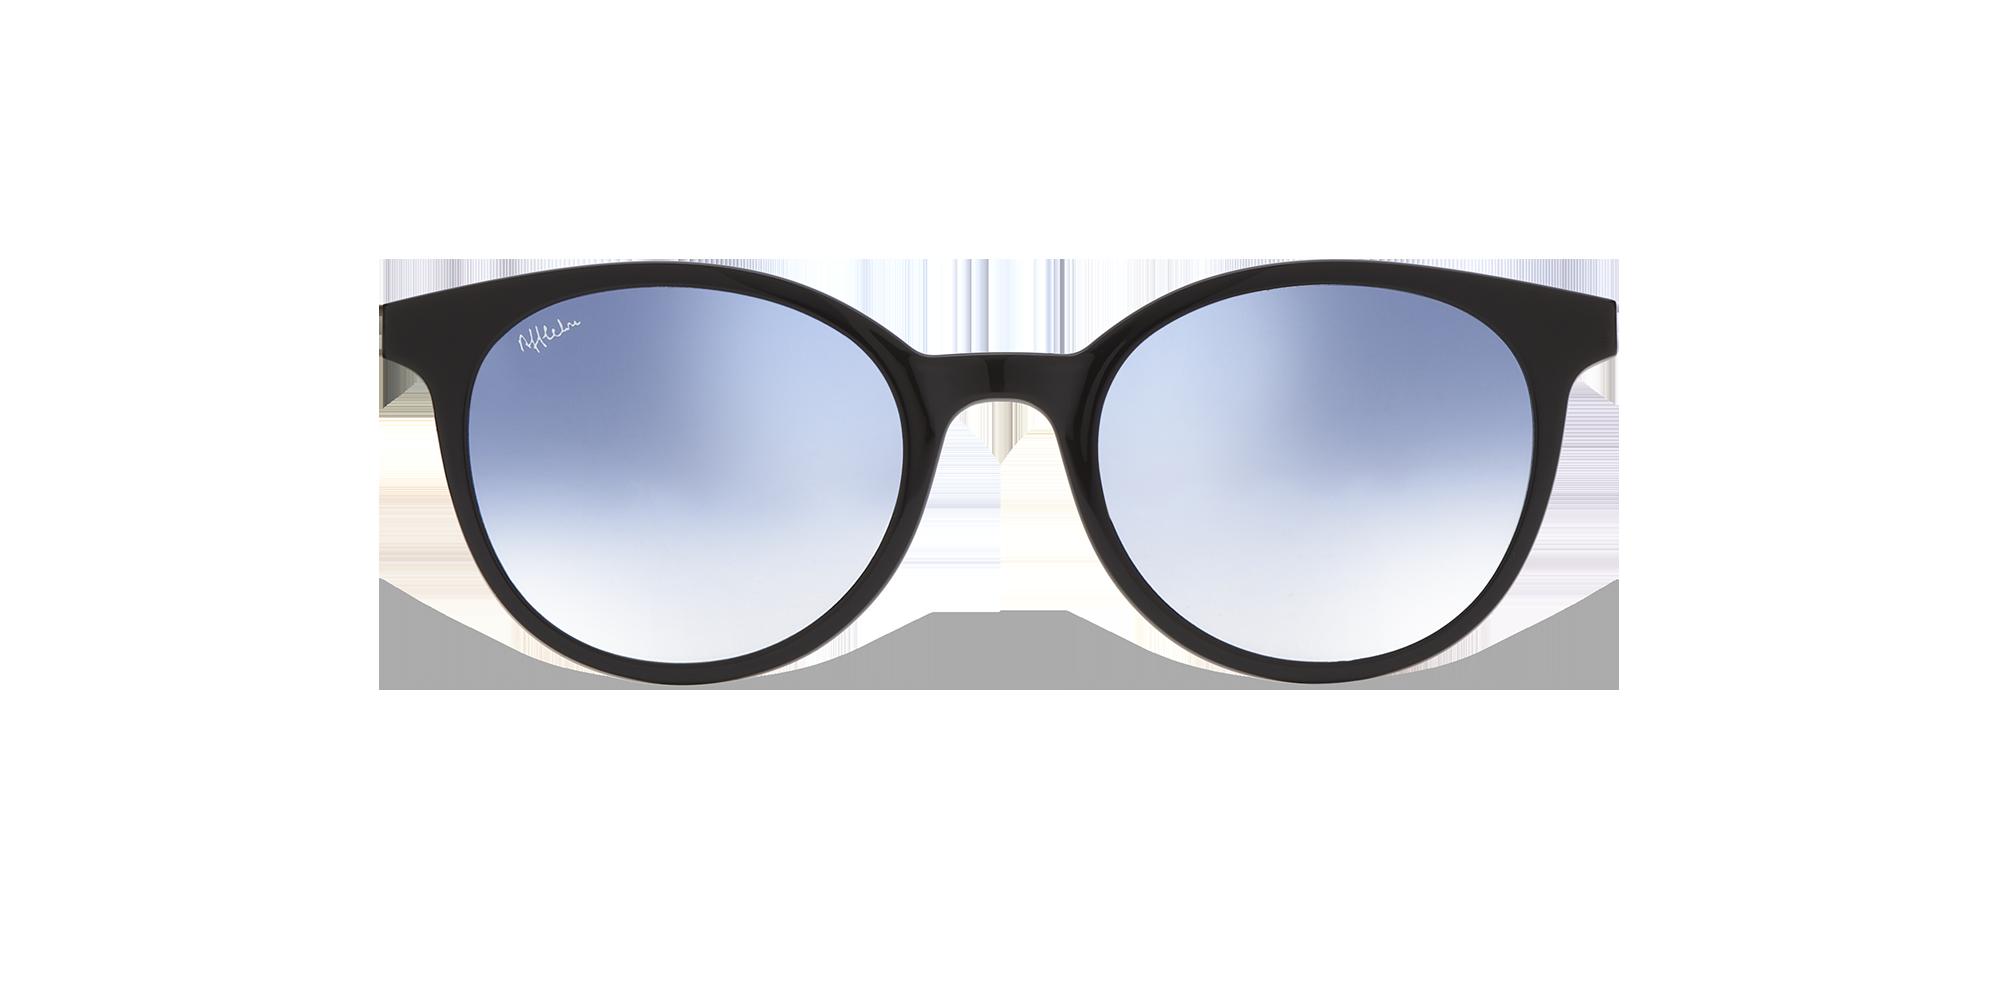 afflelou/france/products/smart_clip/clips_glasses/TMK36SUBR014819.png